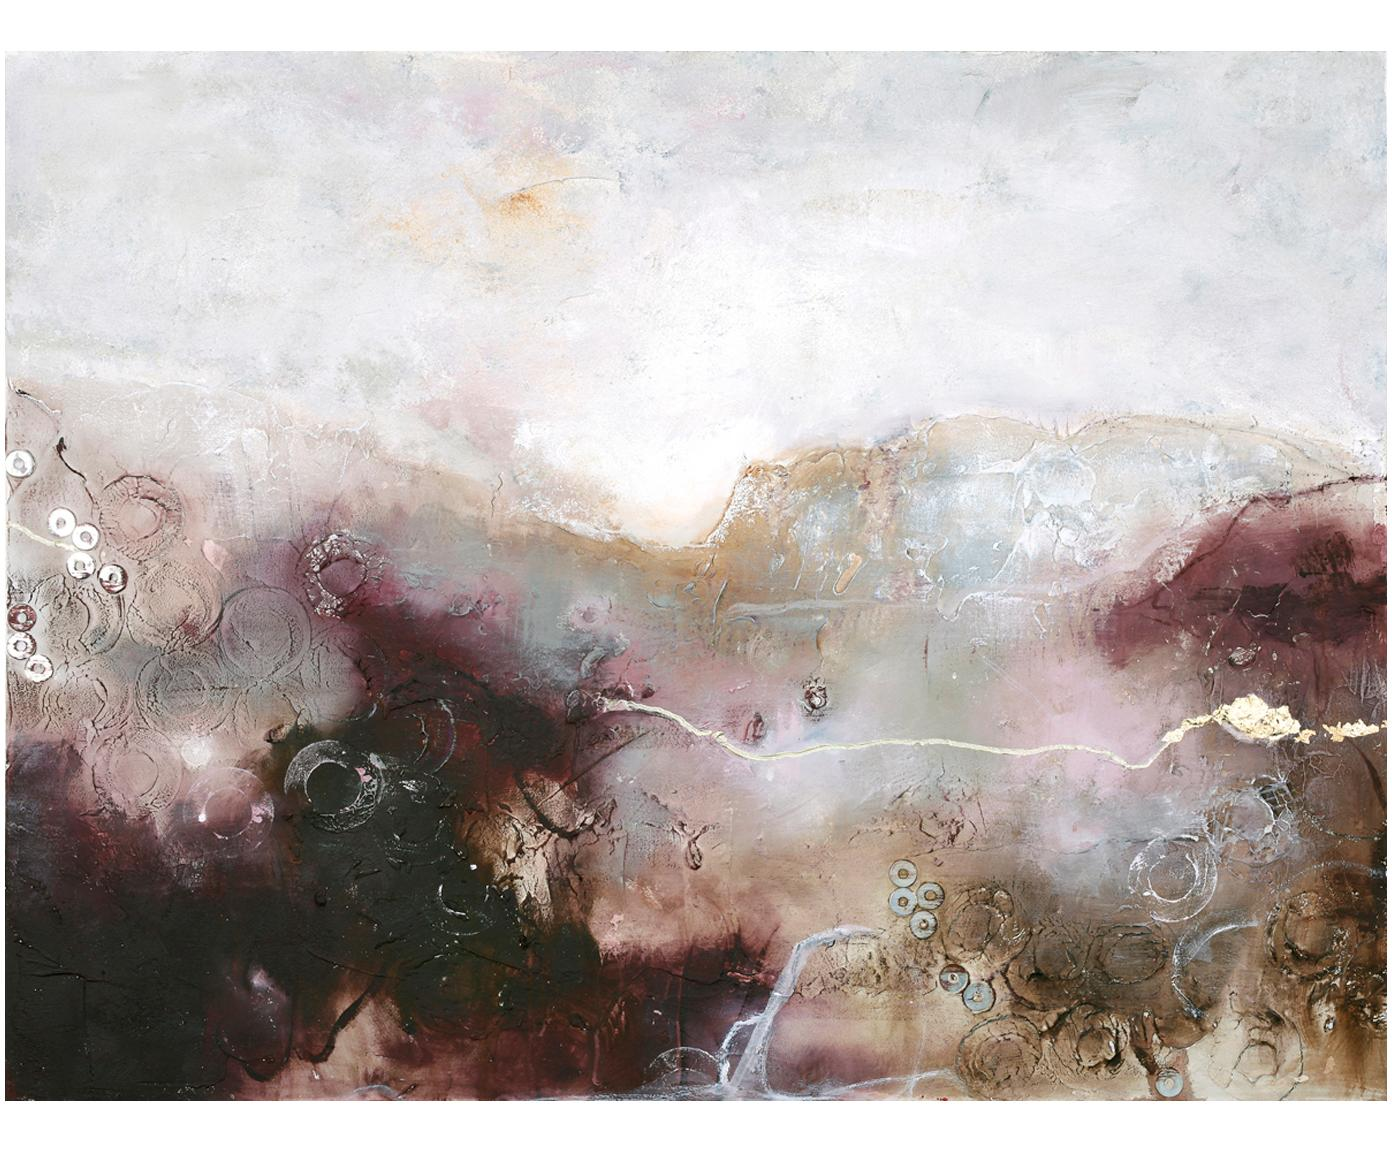 Handgeschilderde canvasafbeelding Turning Red, Afbeelding: olieverf op linnen (300 g, Multicolour, 120 x 90 cm